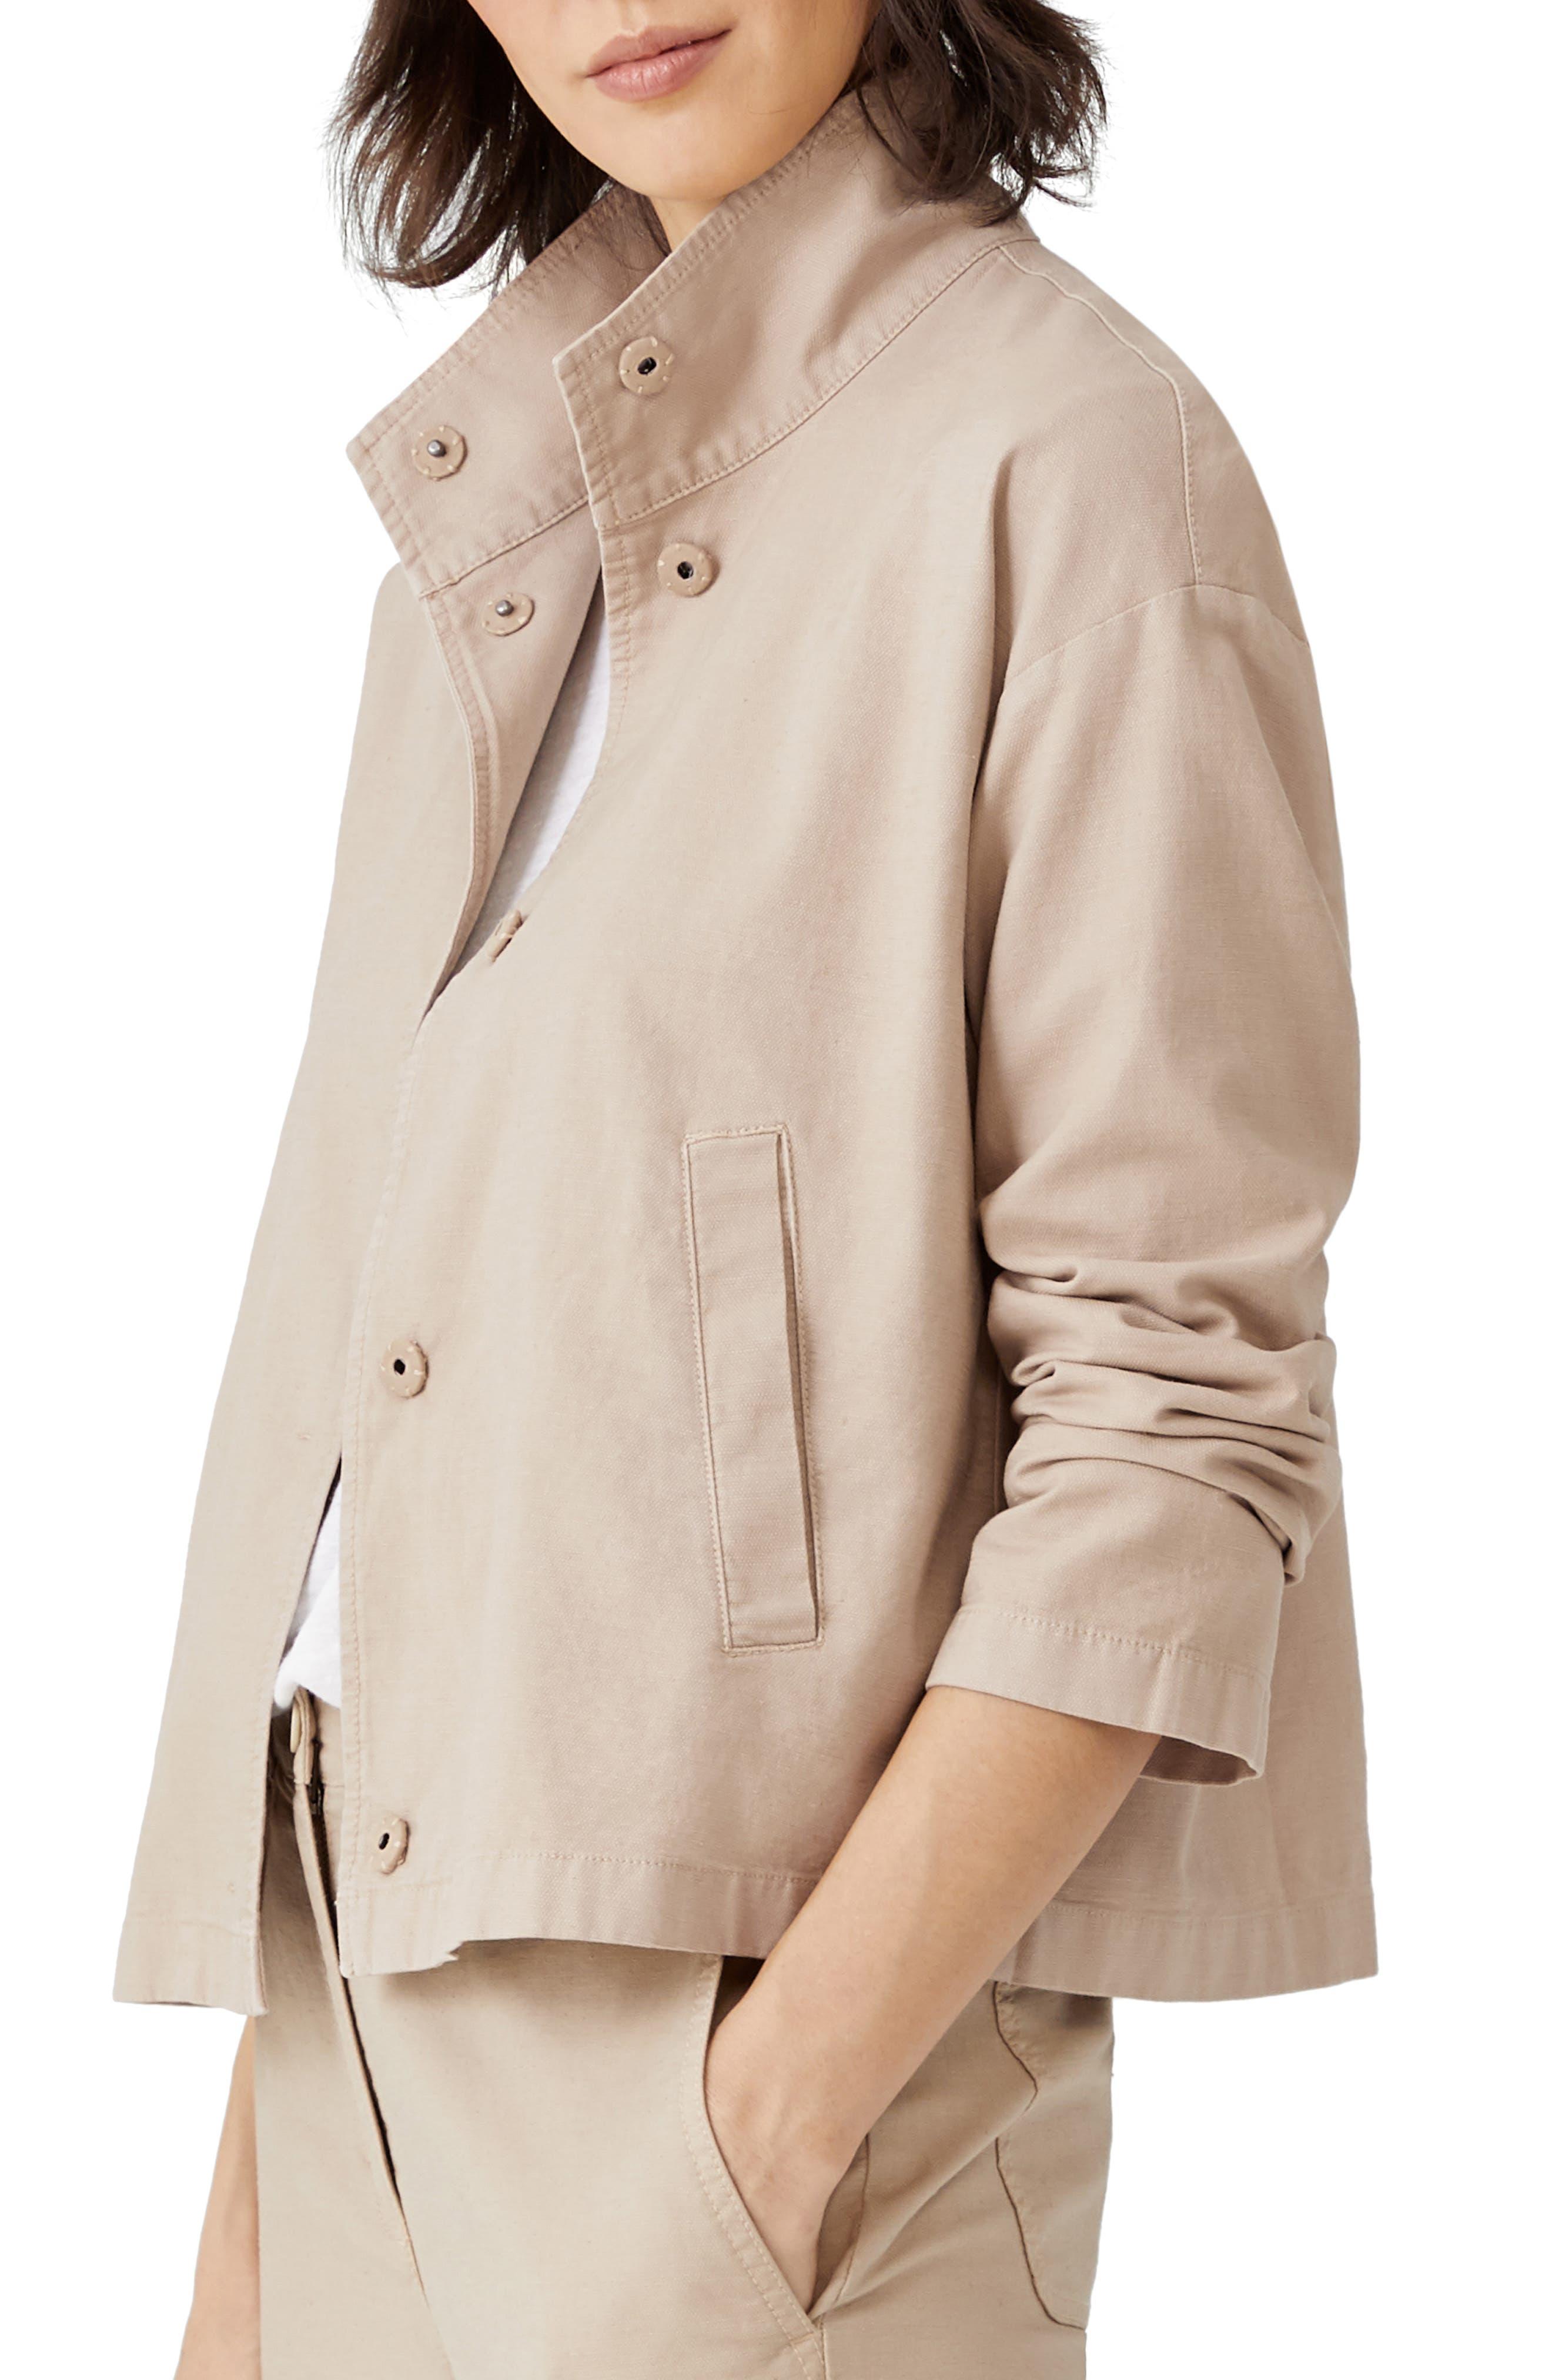 CHIARA longline wool coat jacket trench beige oatmeal off-white black women trendy beautiful fashion stylish fashionista feminine